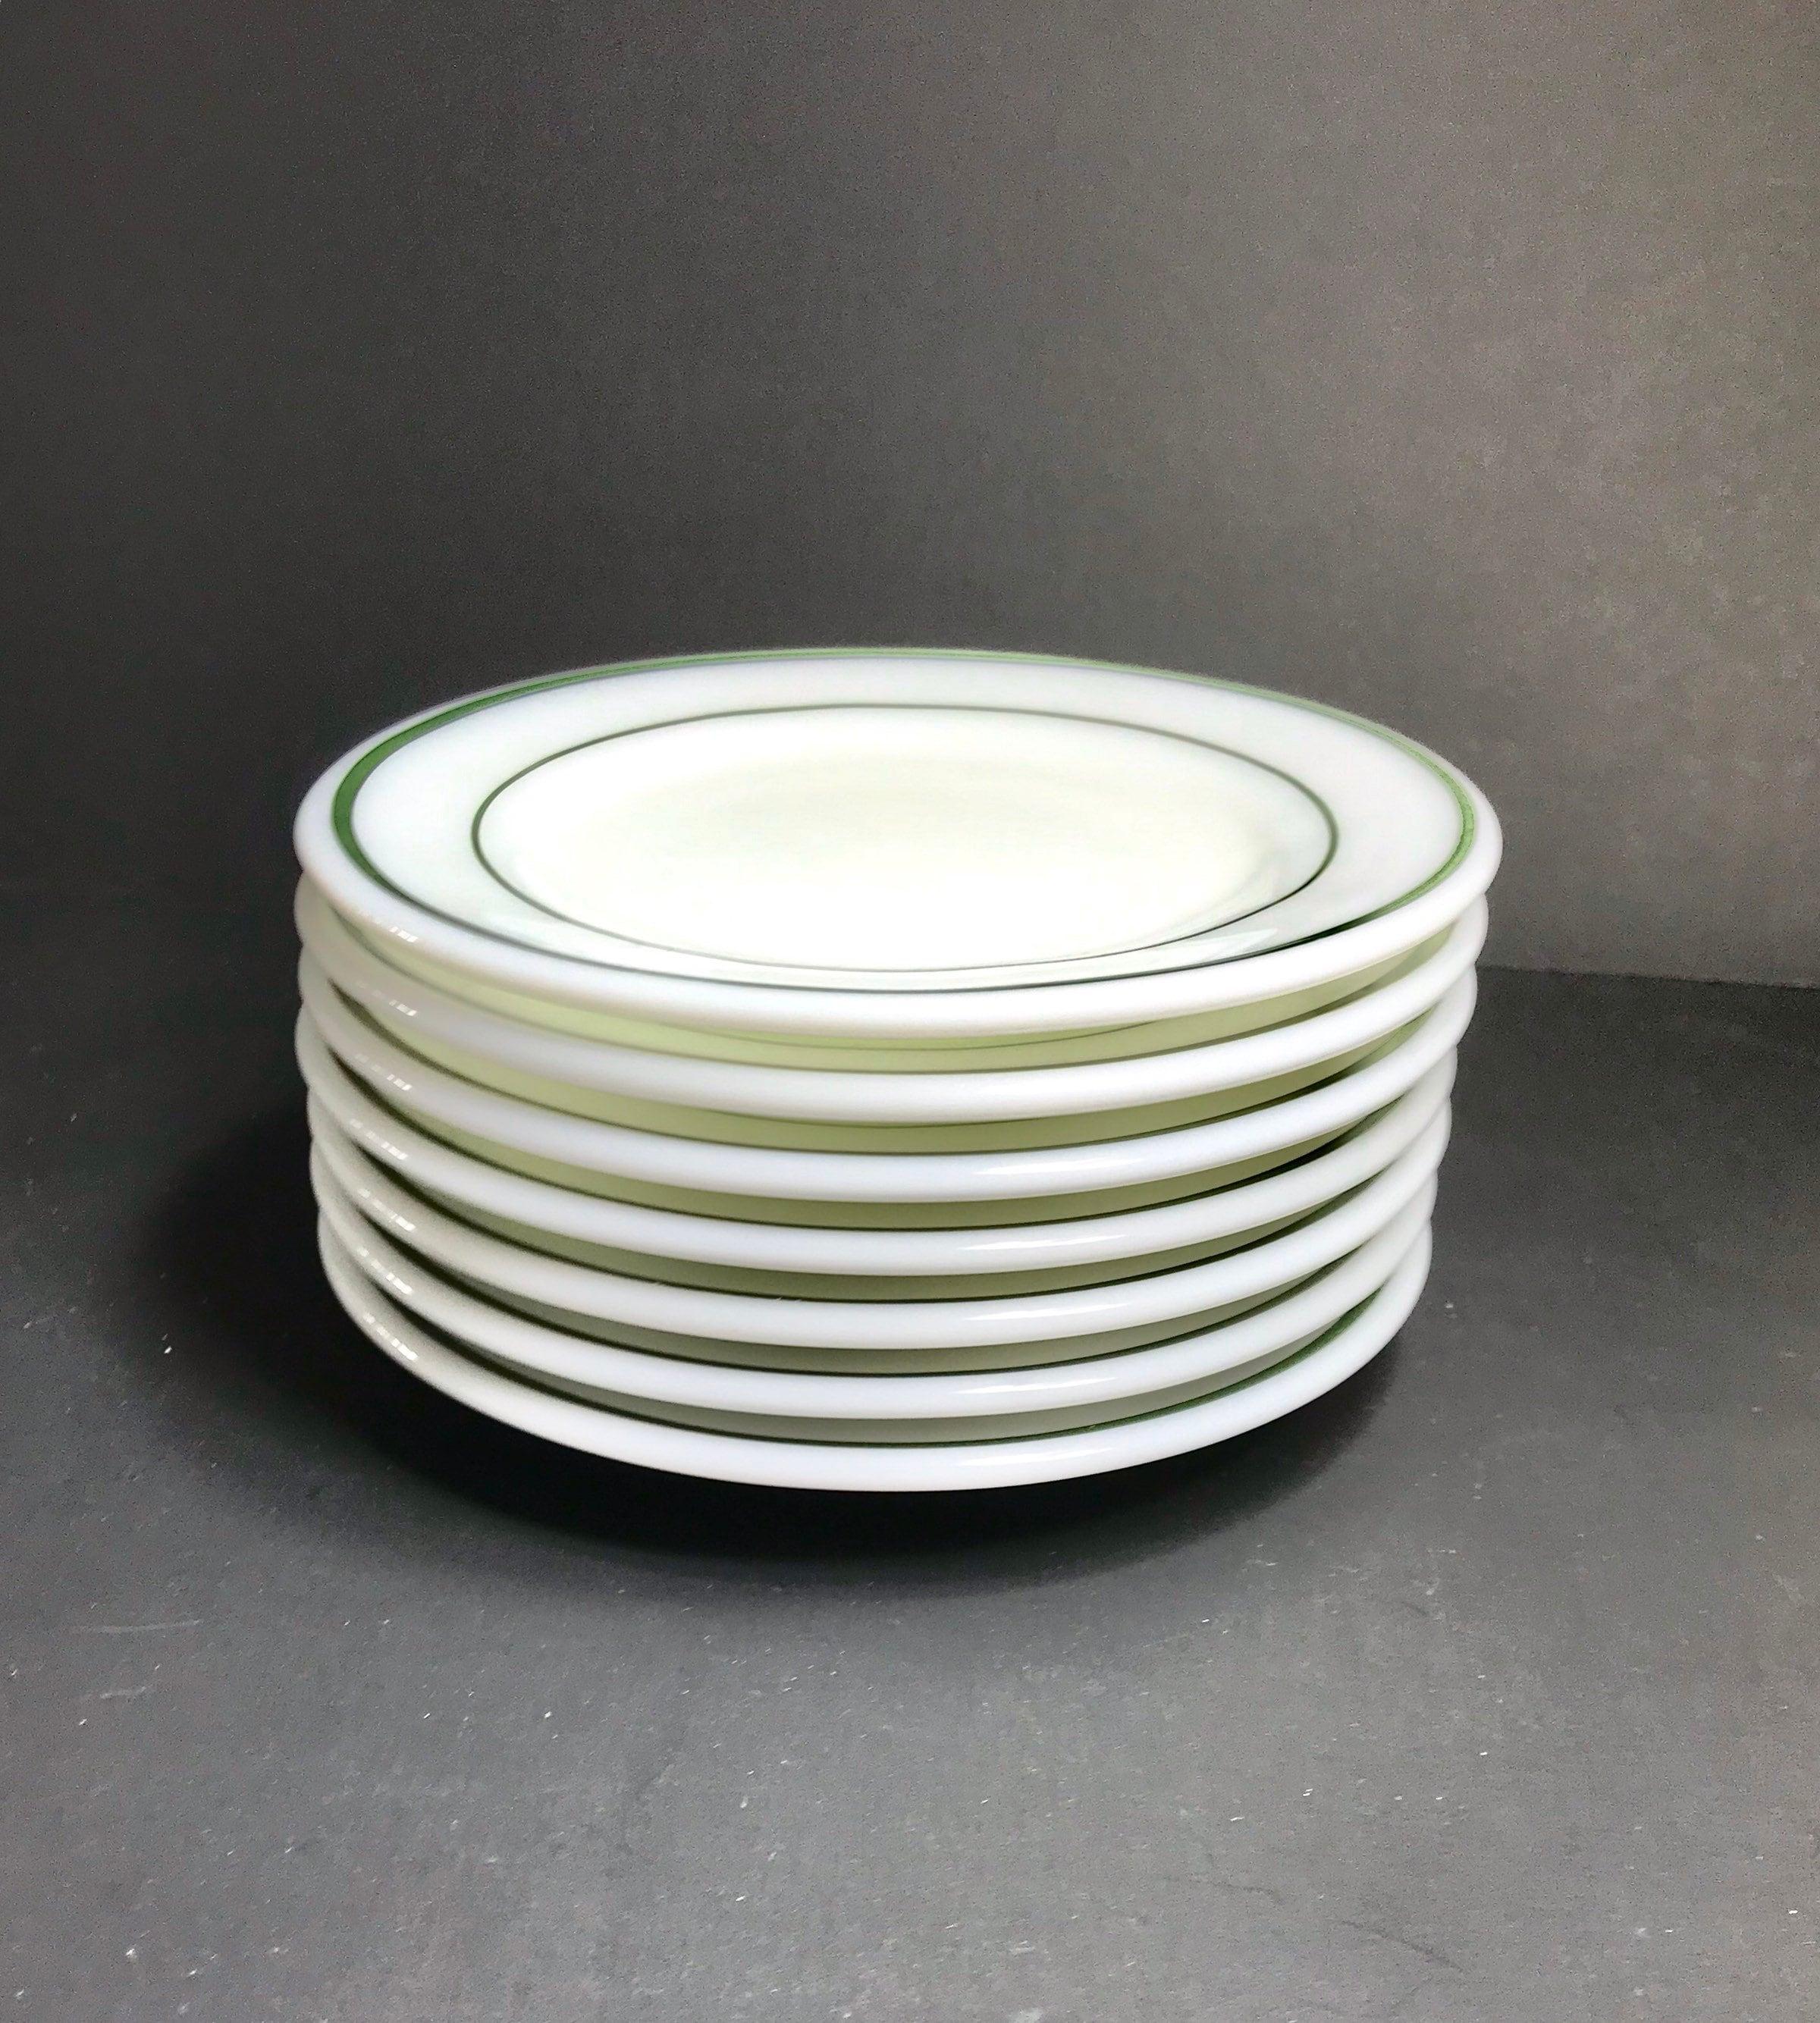 4441b646dff2c Vintage Corning Plates Green Band Opal Dinnerware Plates 7 Salad Plates